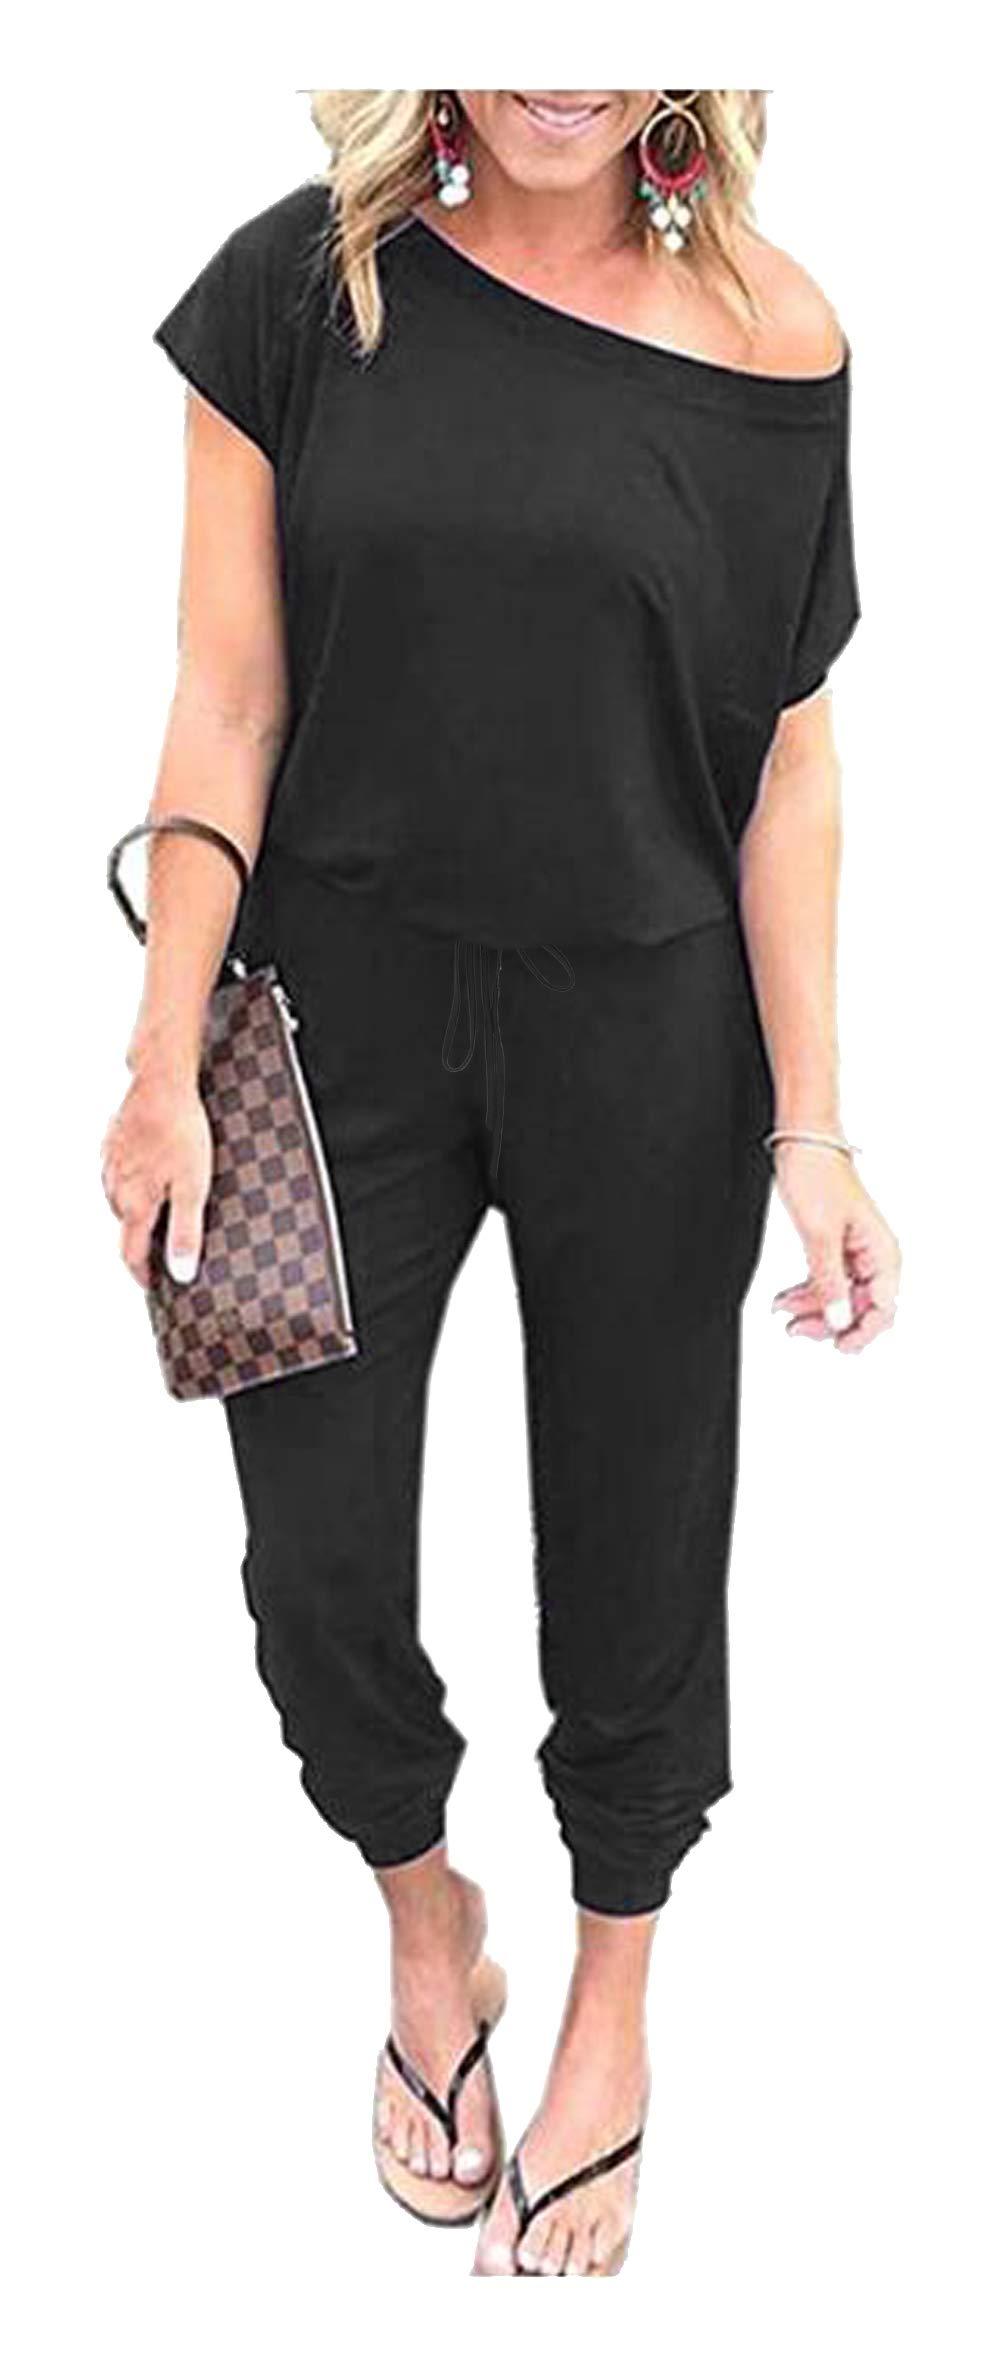 Women's Jumpsuits - Crewneck One Off Shoulder Short Sleeve Elastic Waist Romper Playsuits with Pockets Cxiejian-Black-S BYF-33